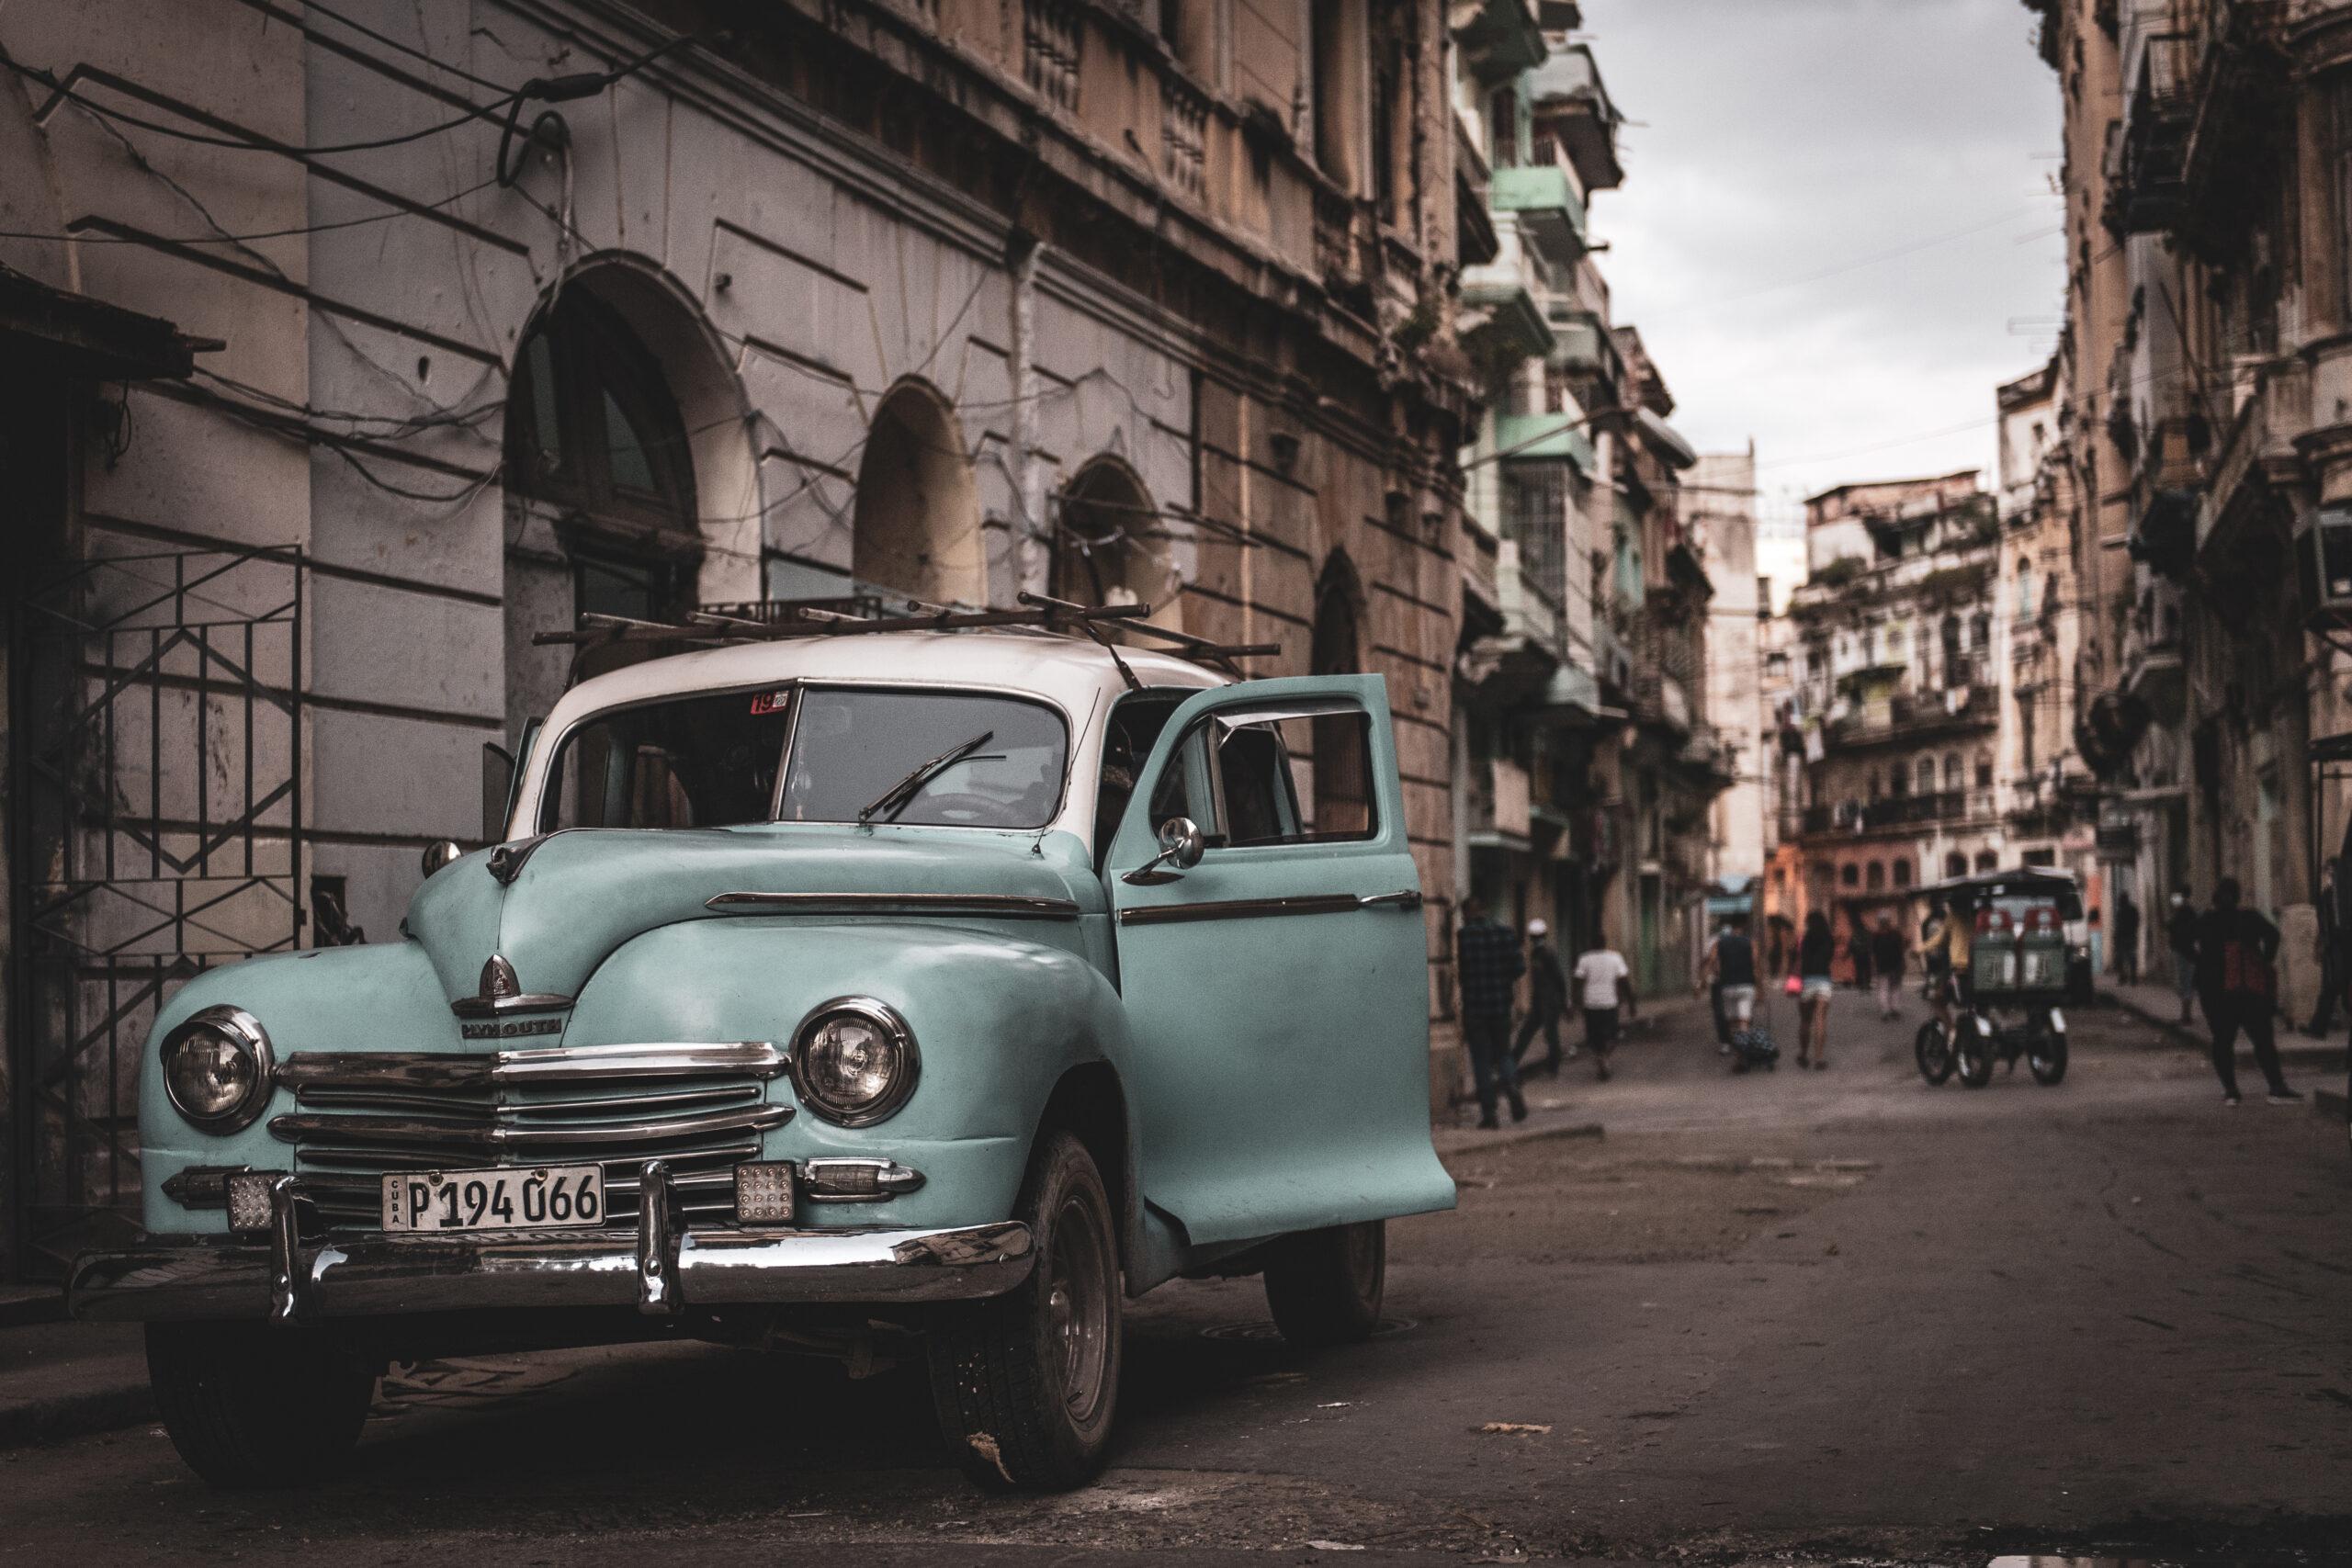 Photographe : Le temps Cubain n°9